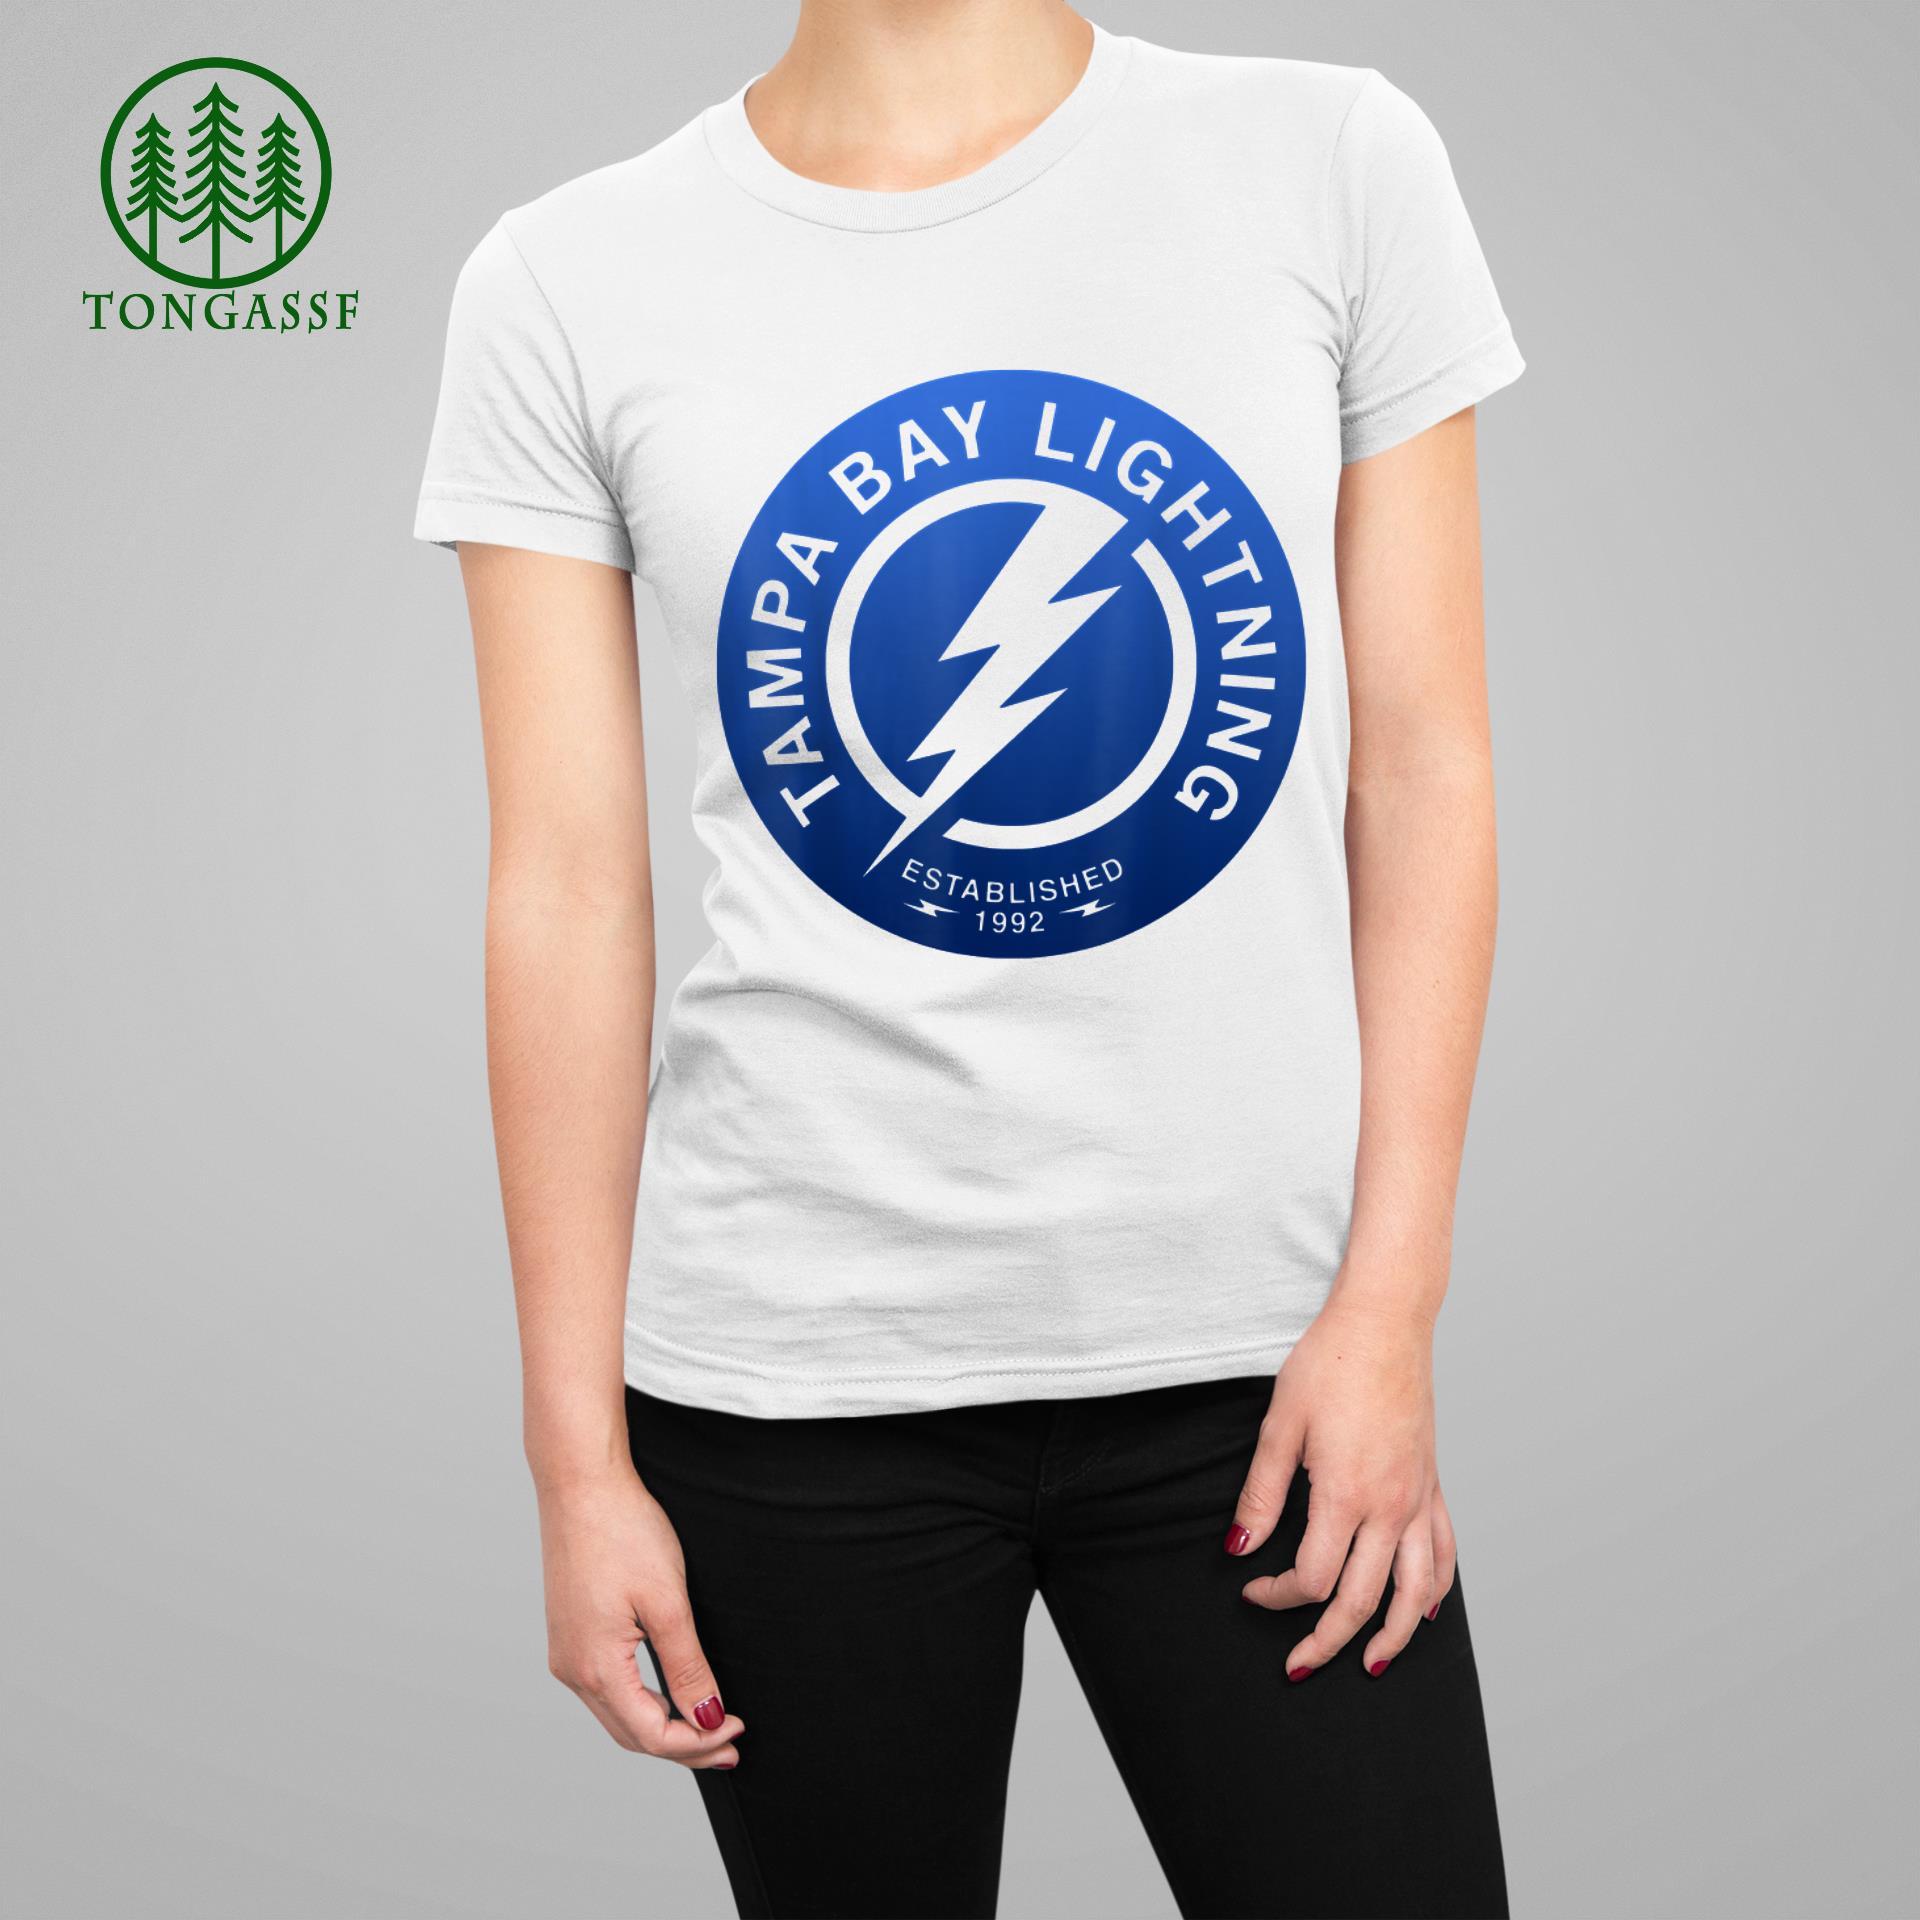 Tampa Bay Lightning Hockey Team Fan Supporters Shirt